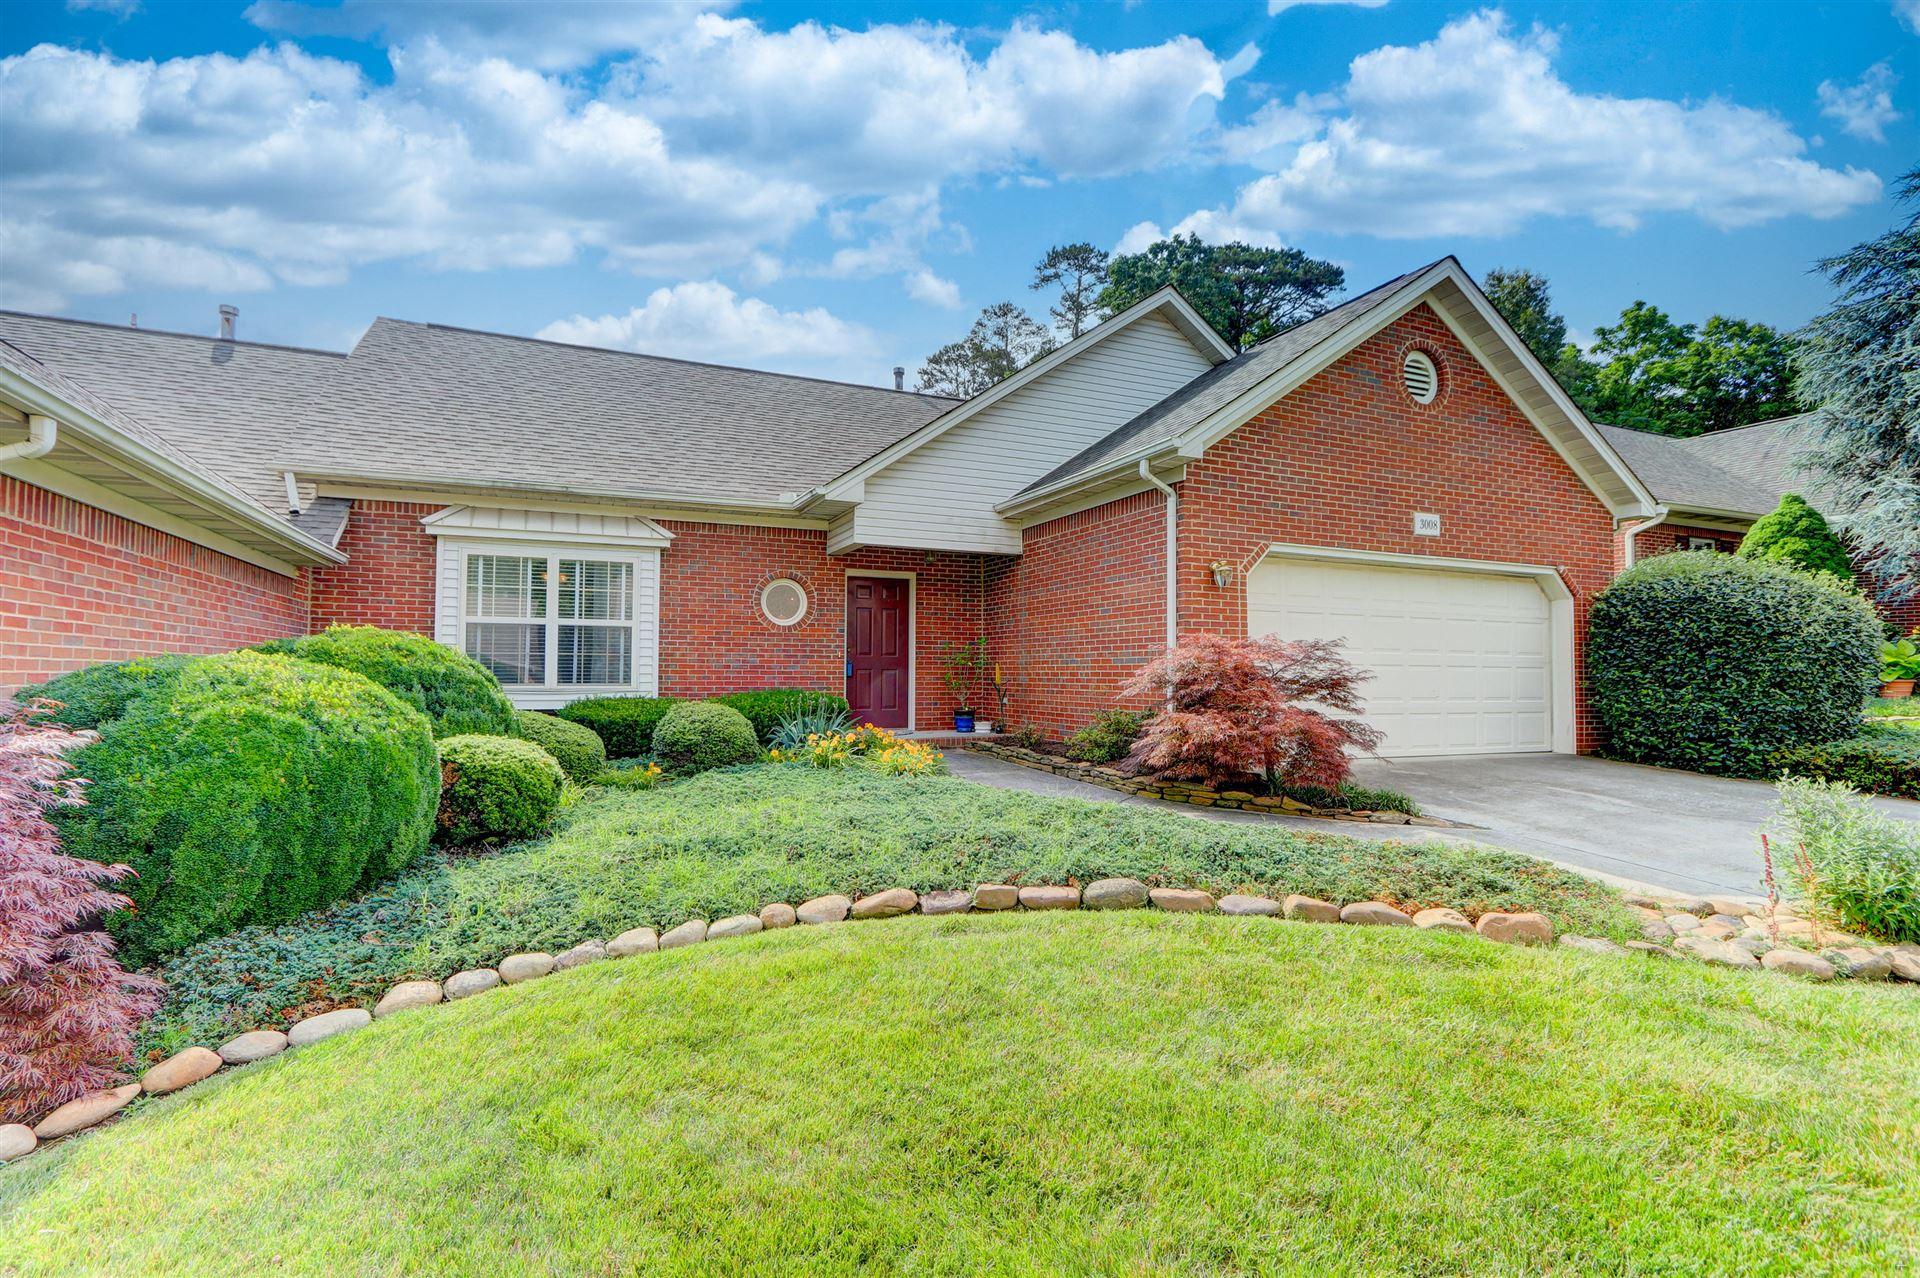 Photo of 3008 Ginnbrooke Lane, Knoxville, TN 37920 (MLS # 1156886)